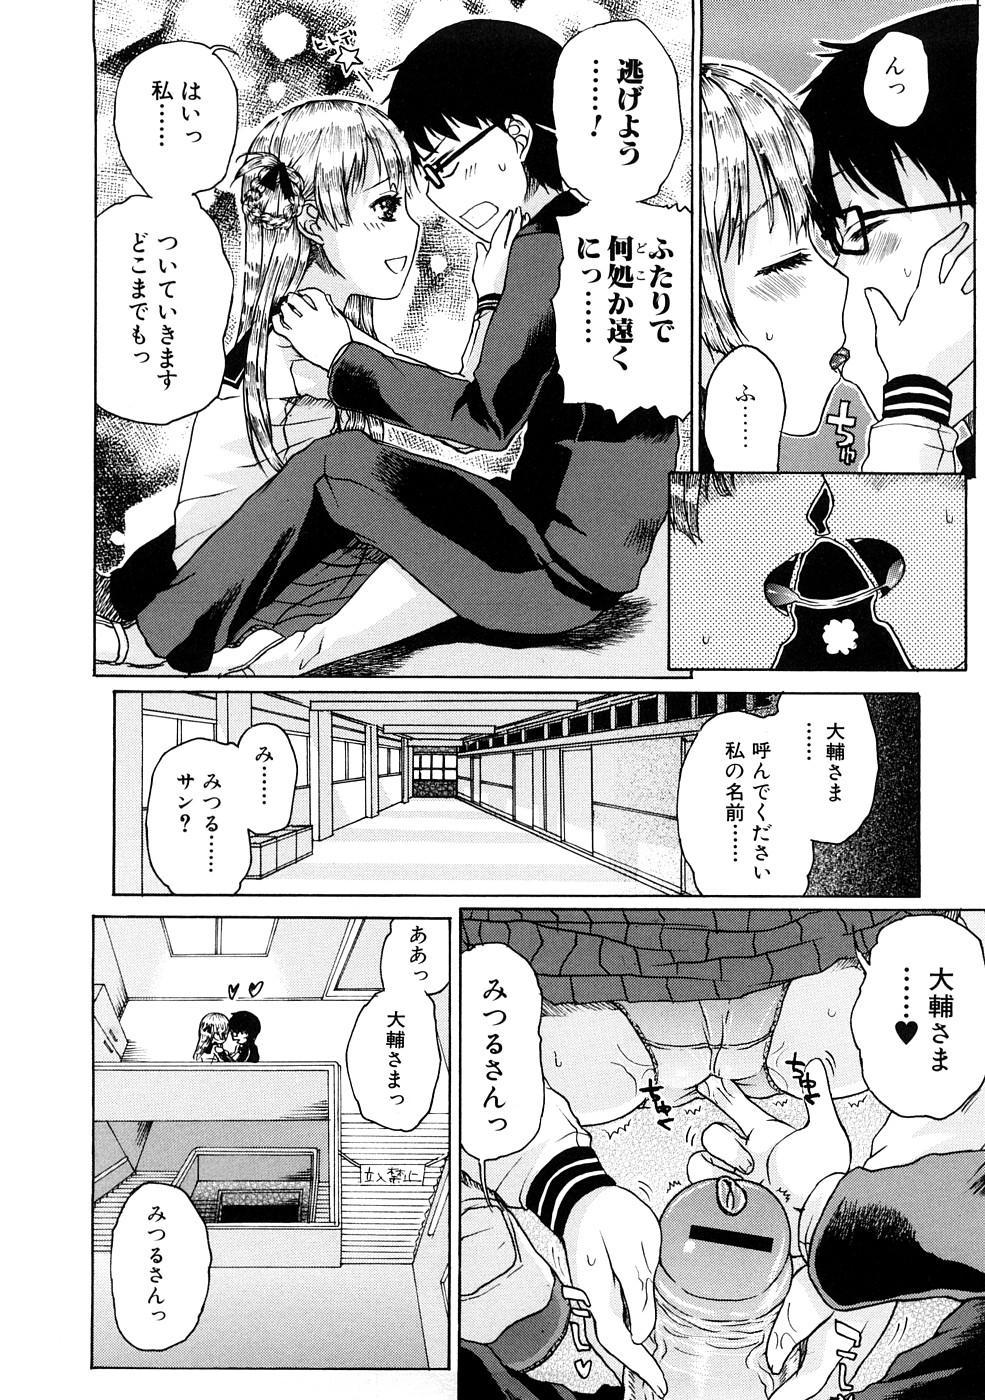 Ecchi de Jibunkatte de Kawaii Ko 11